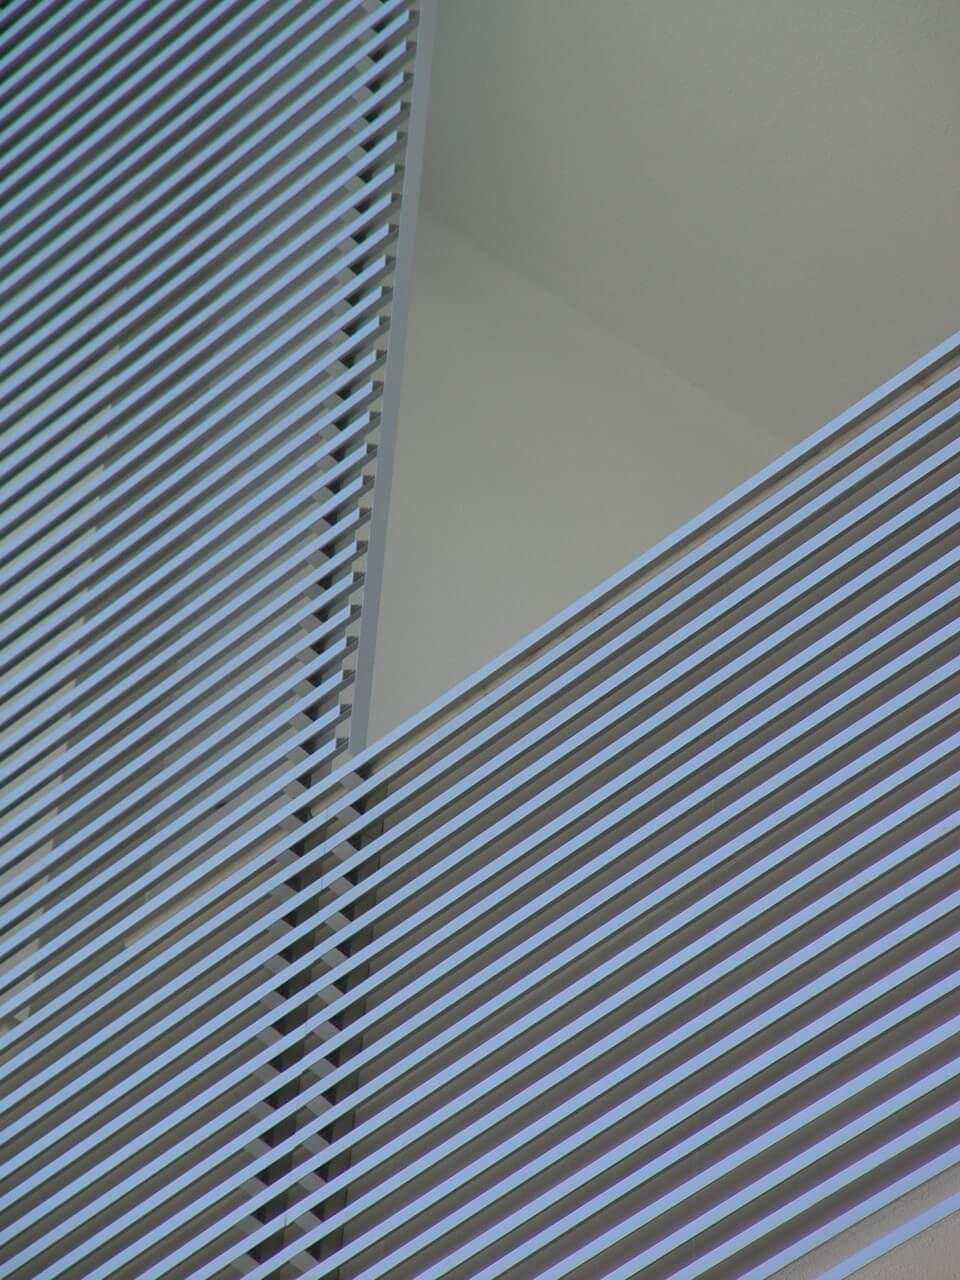 KR | atelier de arquitectura